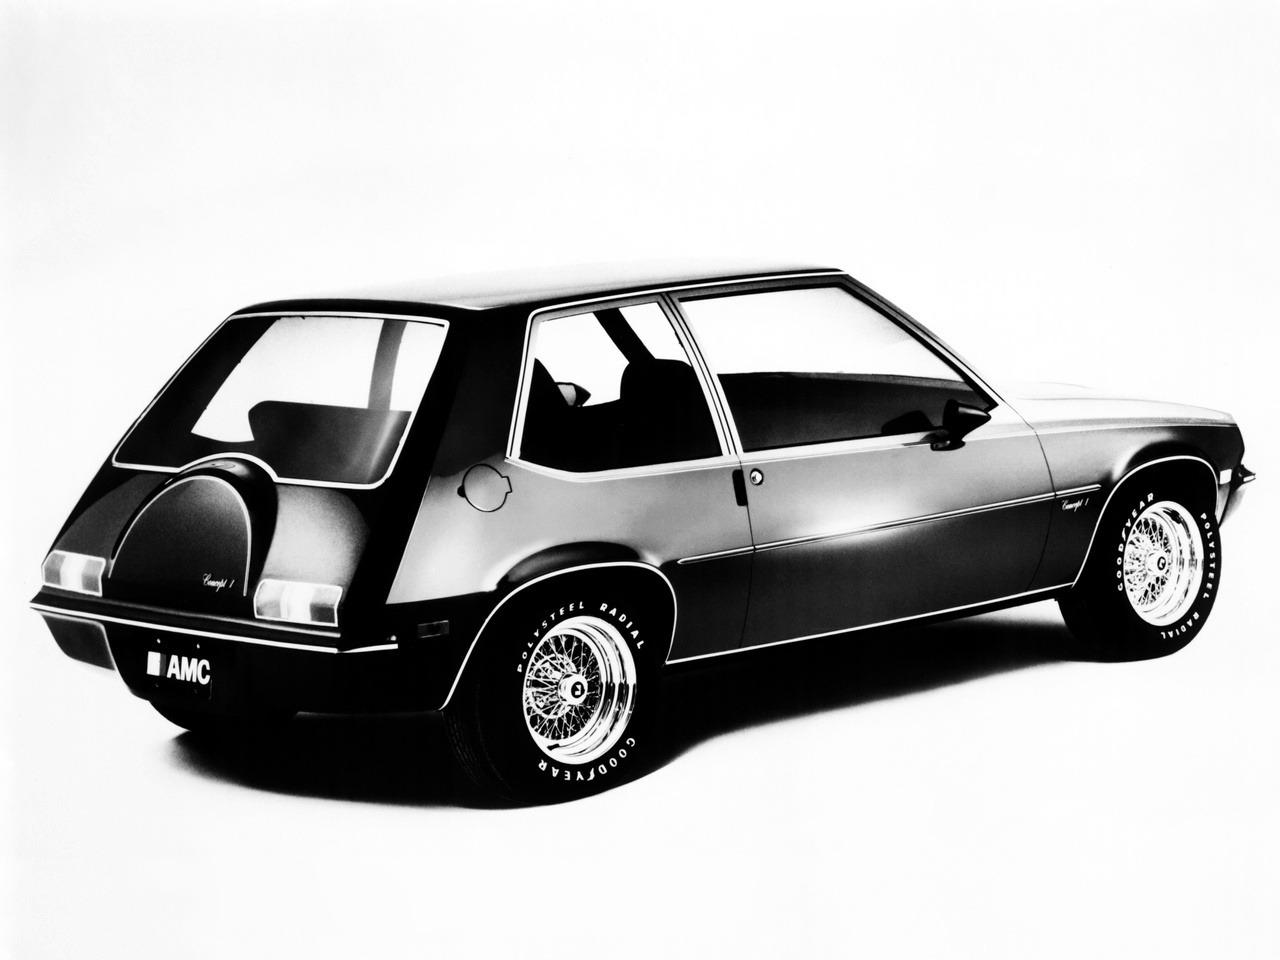 Amc concept cars